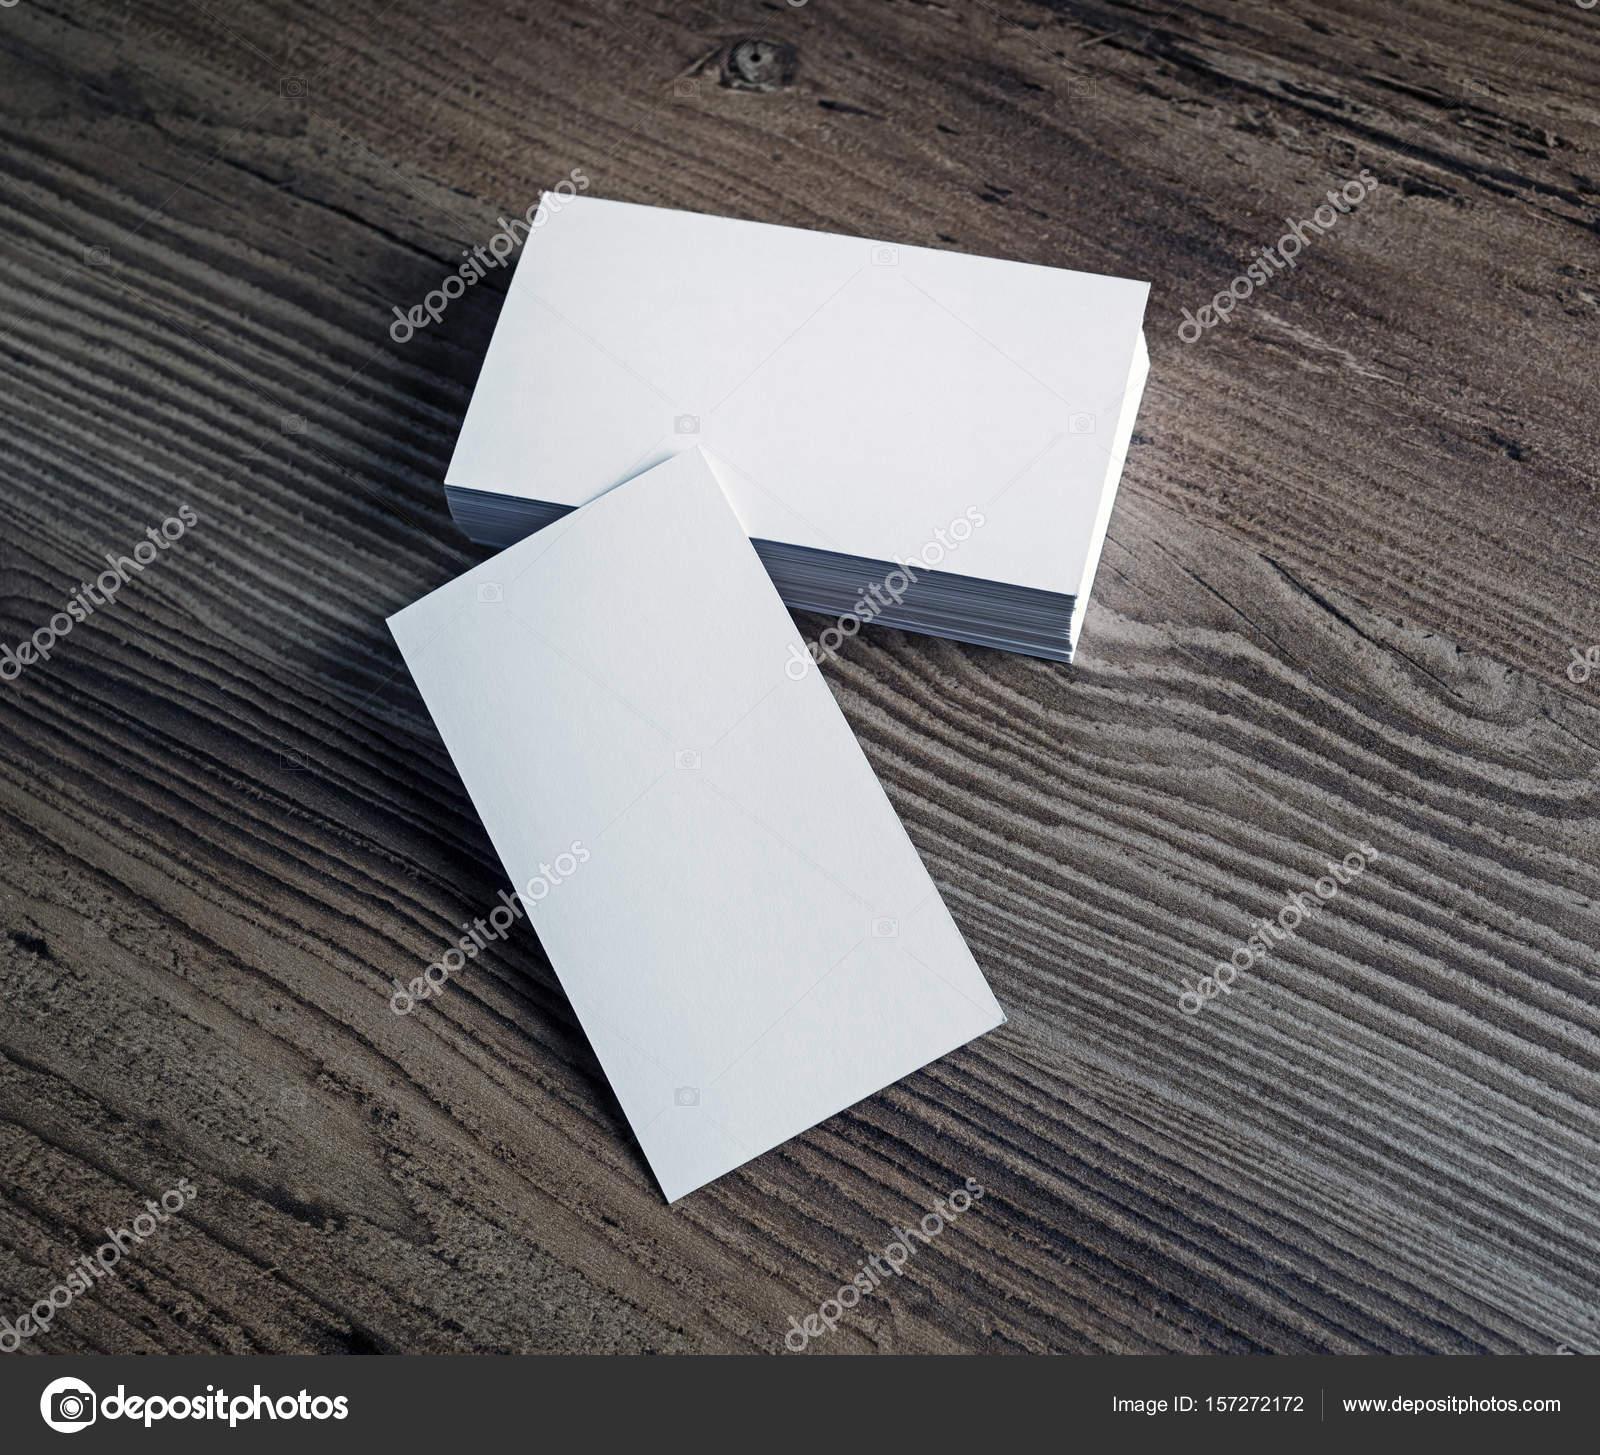 Blank white business cards — Stock Photo © Veresovich #157272172